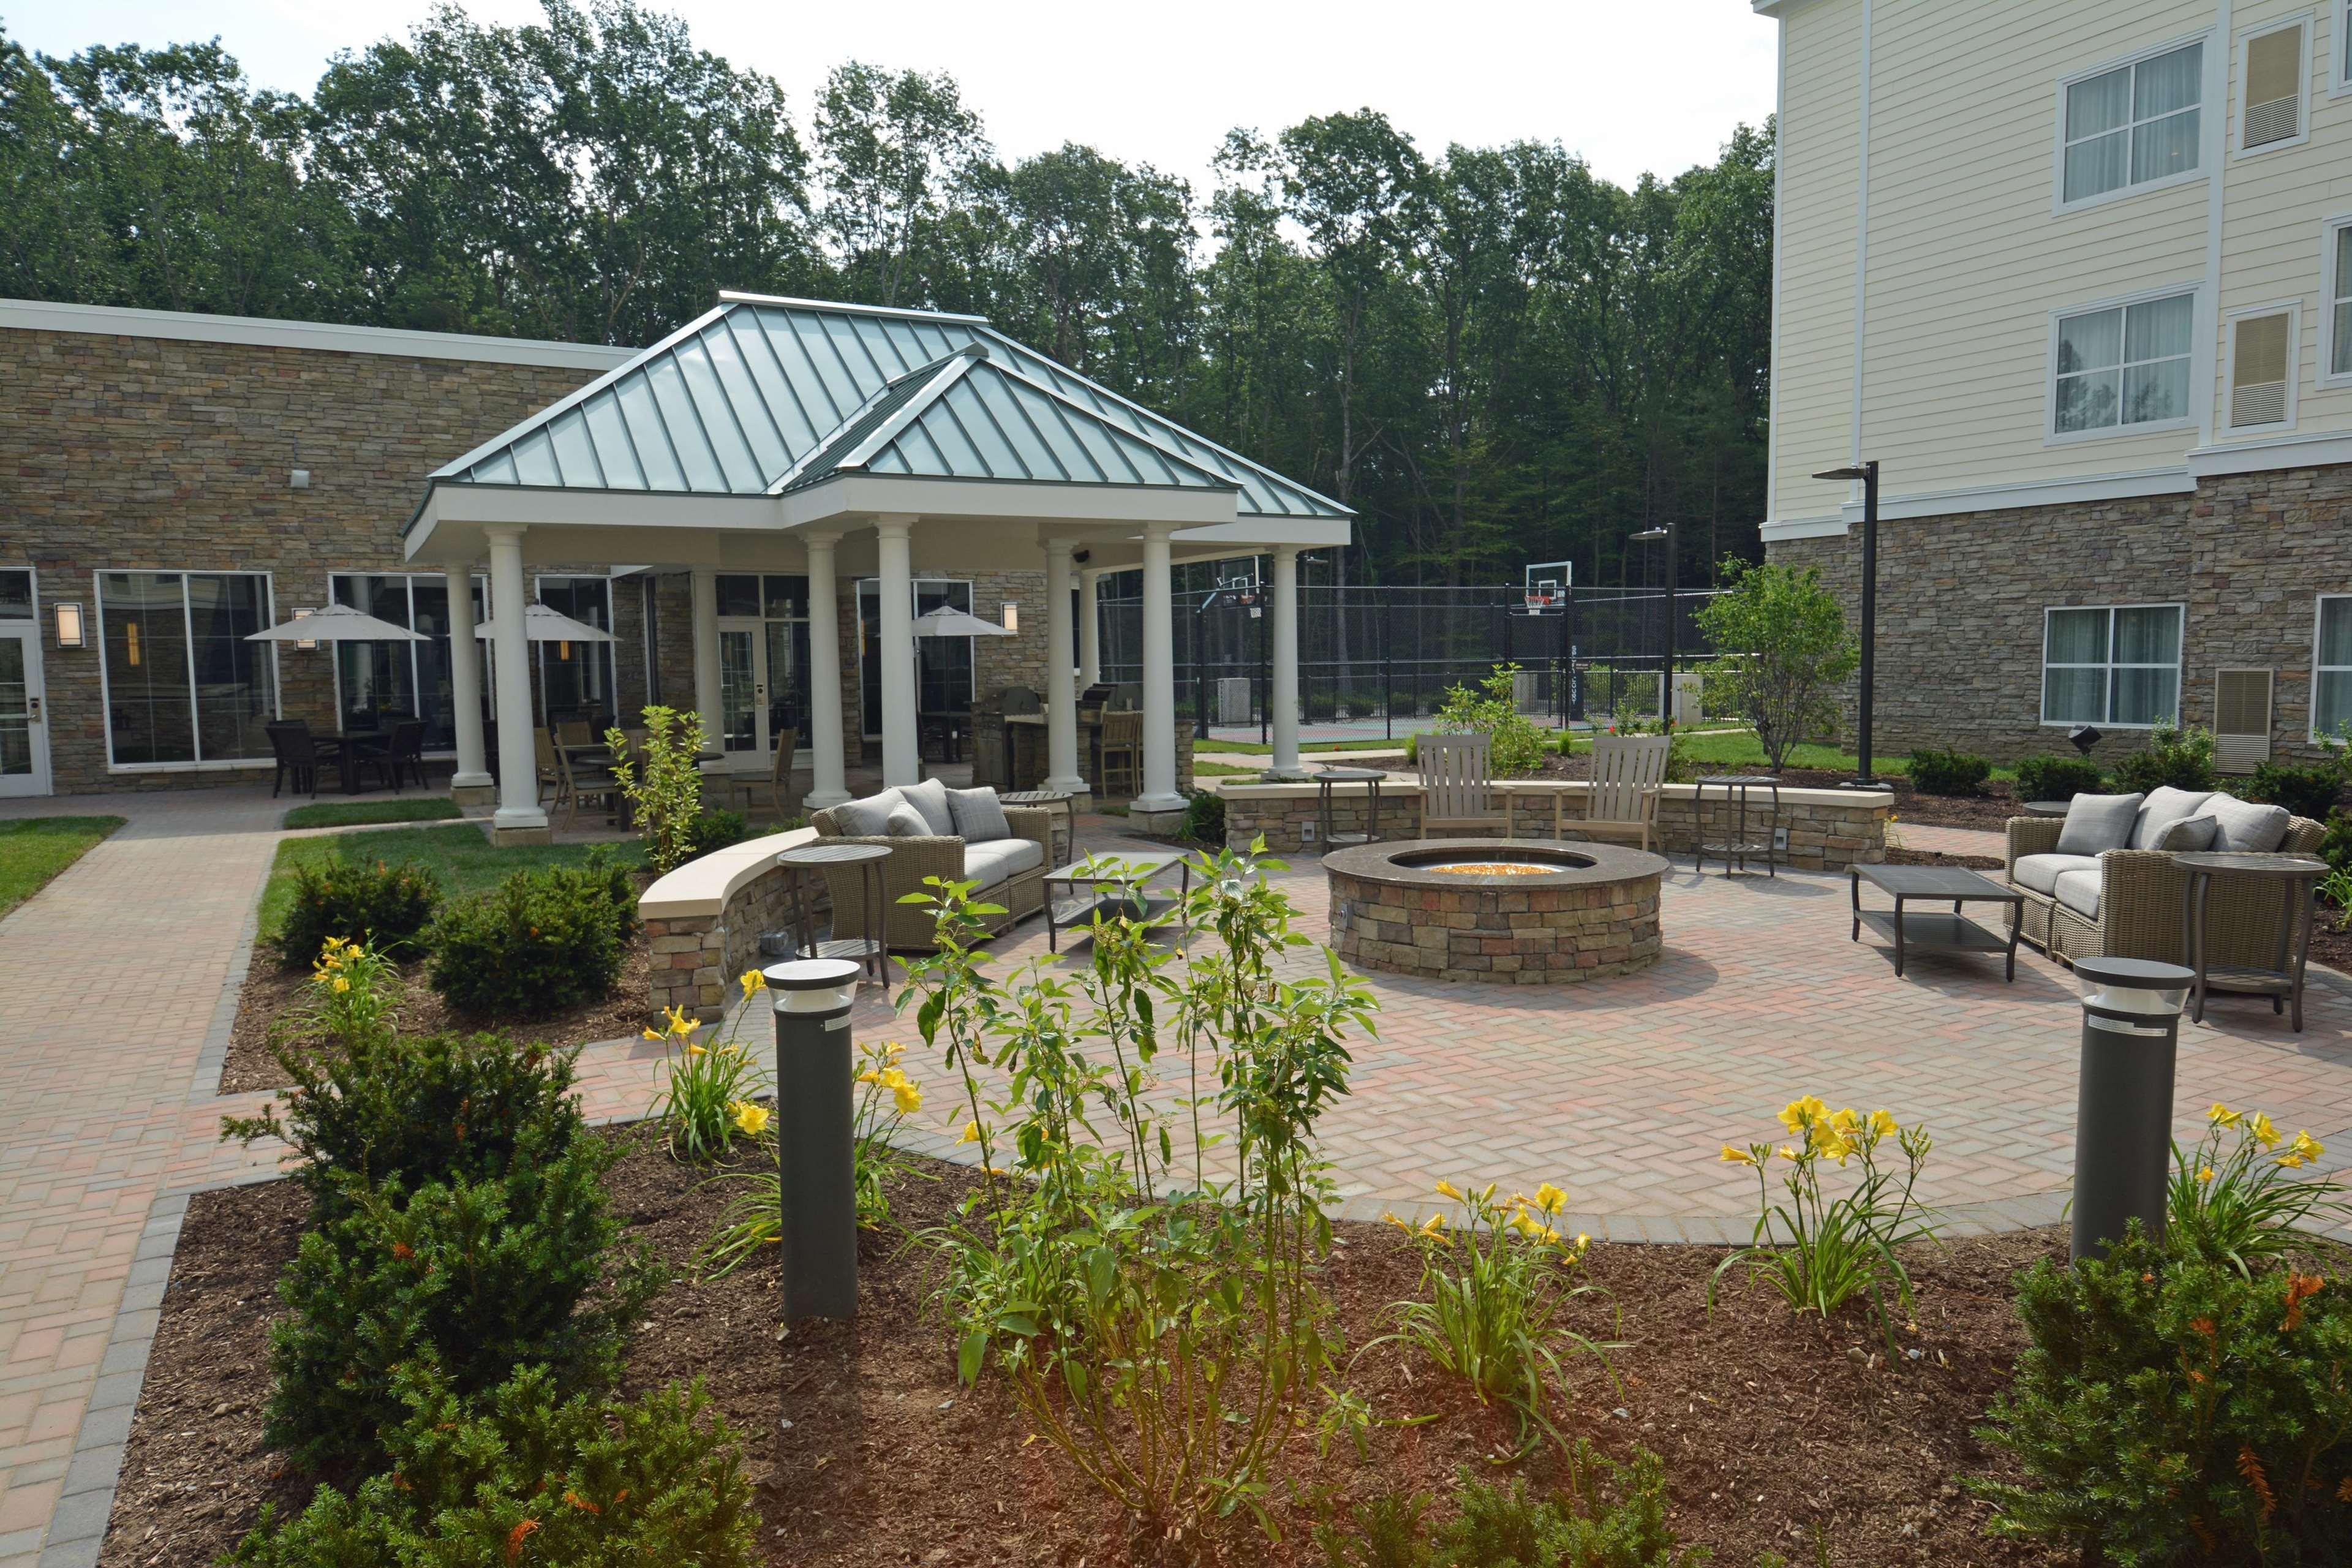 Homewood Suites by Hilton Saratoga Springs image 3